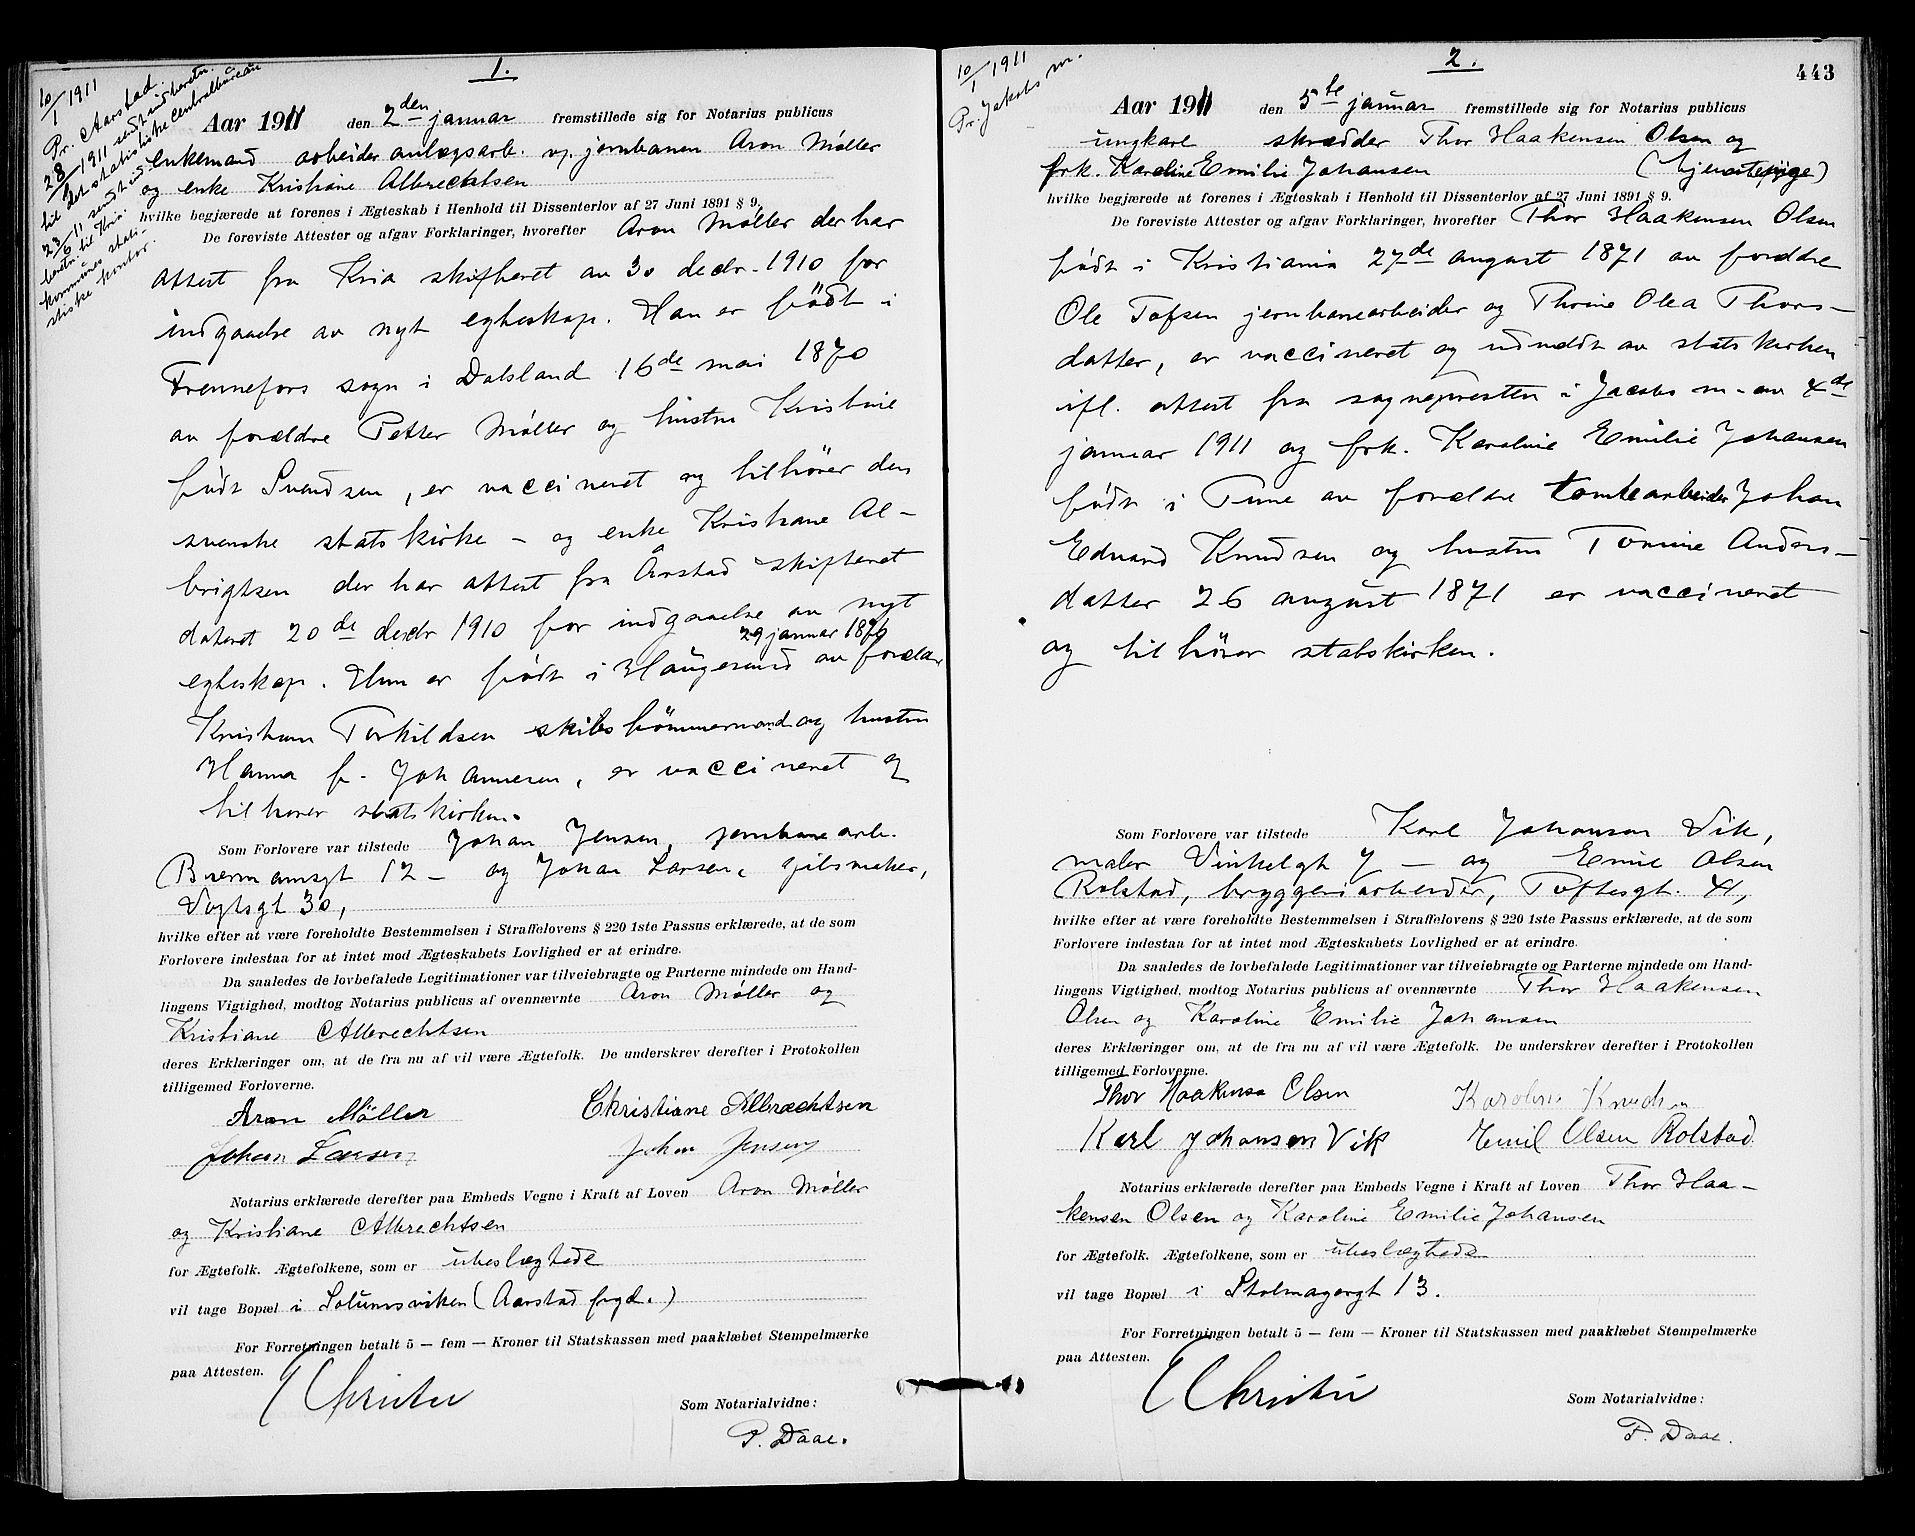 SAO, Oslo byfogd avd. I, L/Lb/Lbb/L0007: Notarialprotokoll, rekke II: Vigsler, 1907-1911, s. 442b-443a